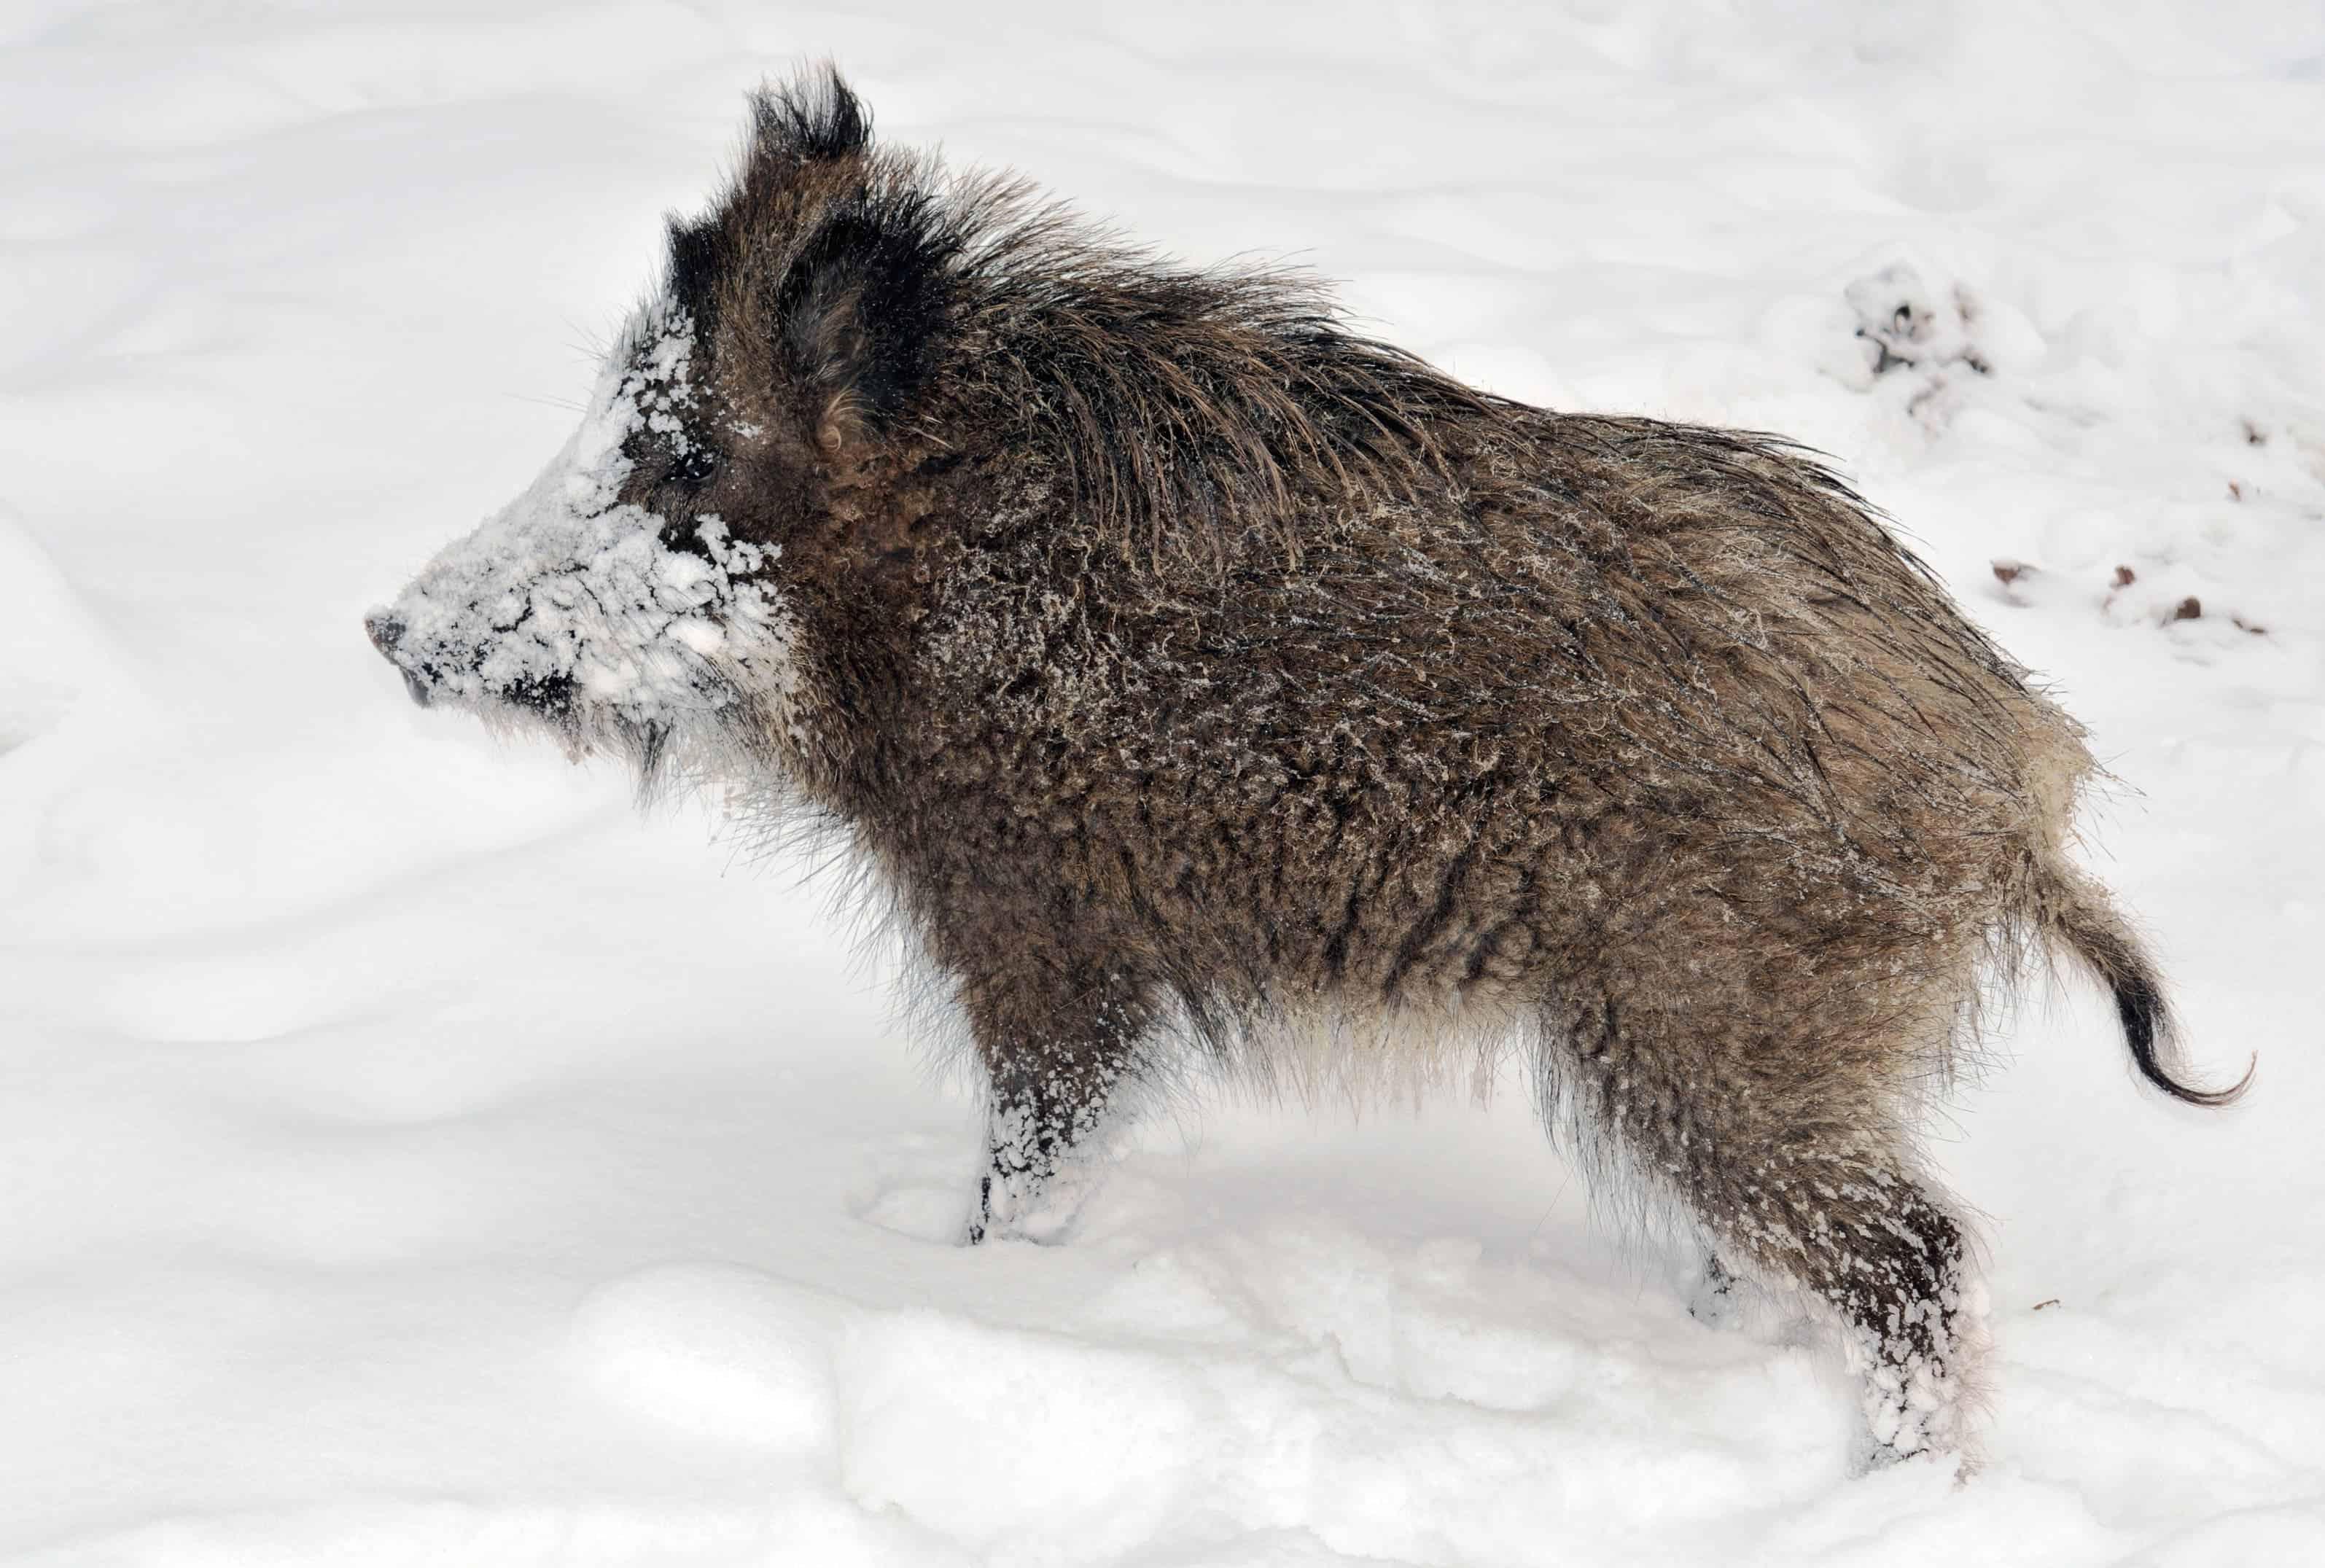 Radioactive boars spark concern in Sweden